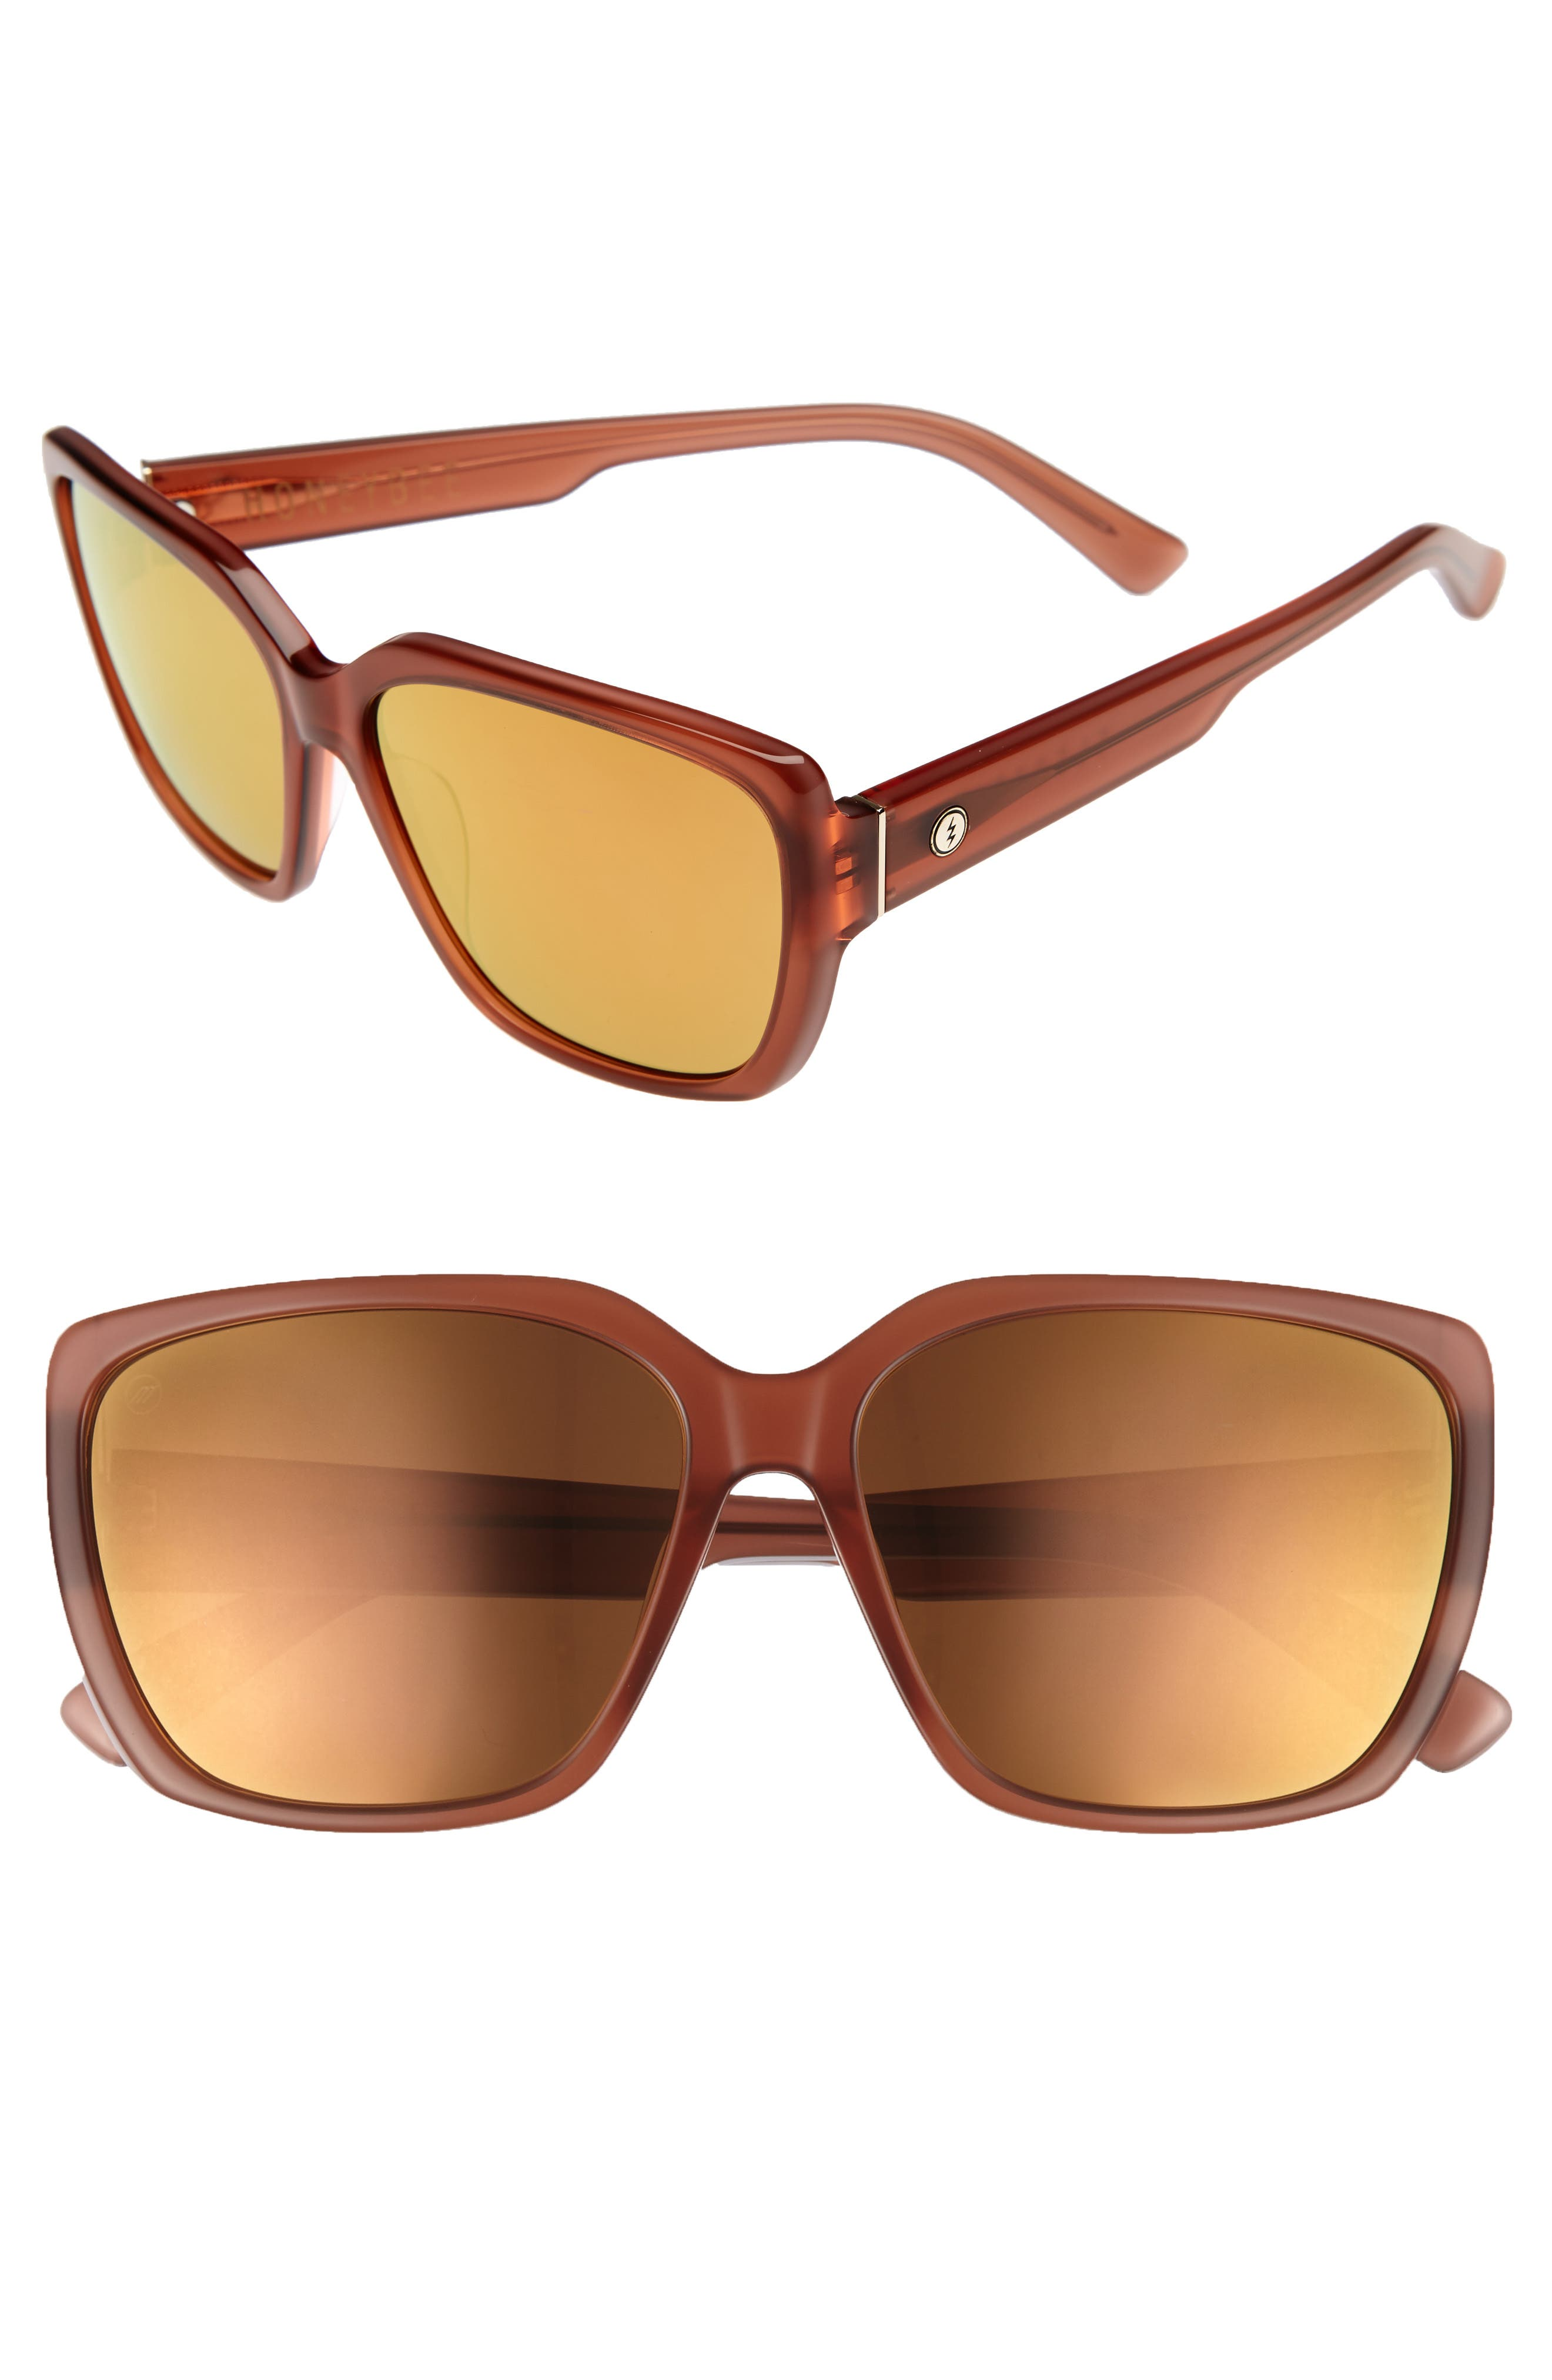 Honey Bee 60mm Mirrored Sunglasses,                             Main thumbnail 1, color,                             CALAFIA ROSE/ CHAMPAGNE